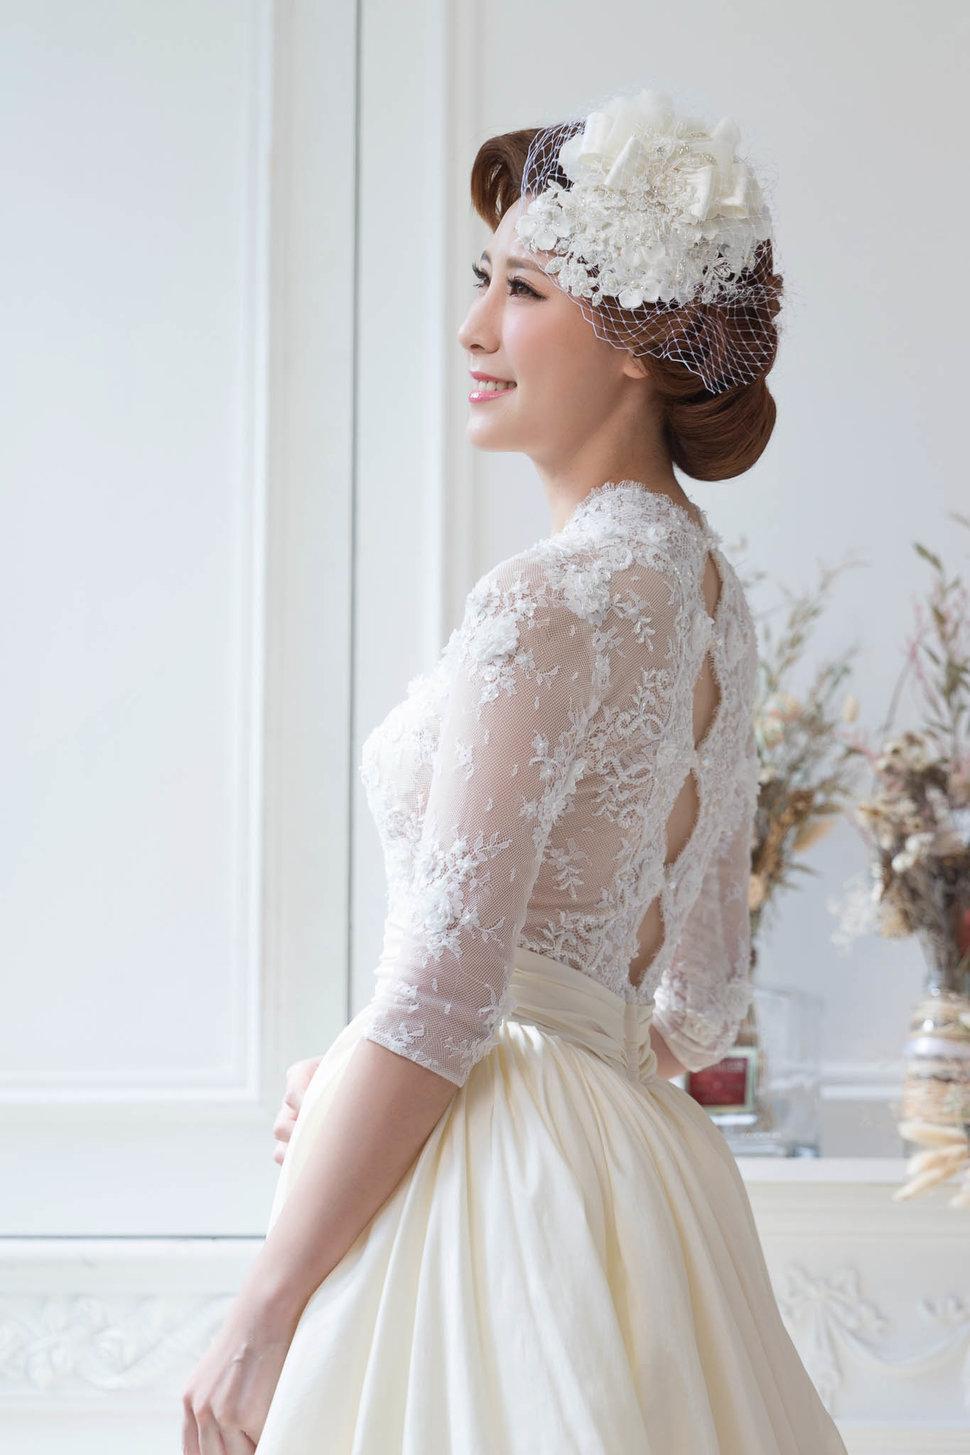 18PHOTO自主婚紗-潤兒(編號:406263) - 18PHOTO 婚紗影像攝影工作室 - 結婚吧